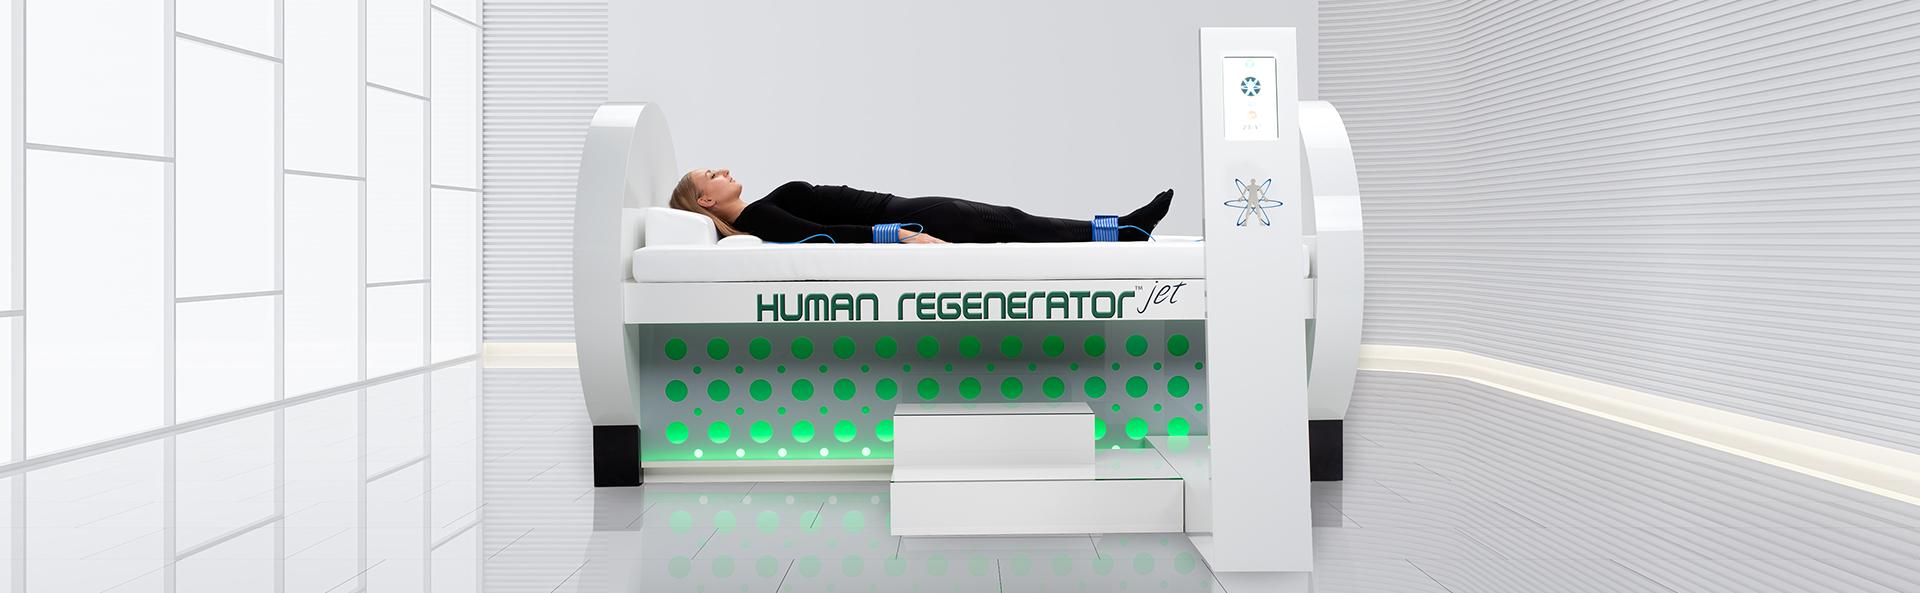 Human Regenerator Jet new 2021